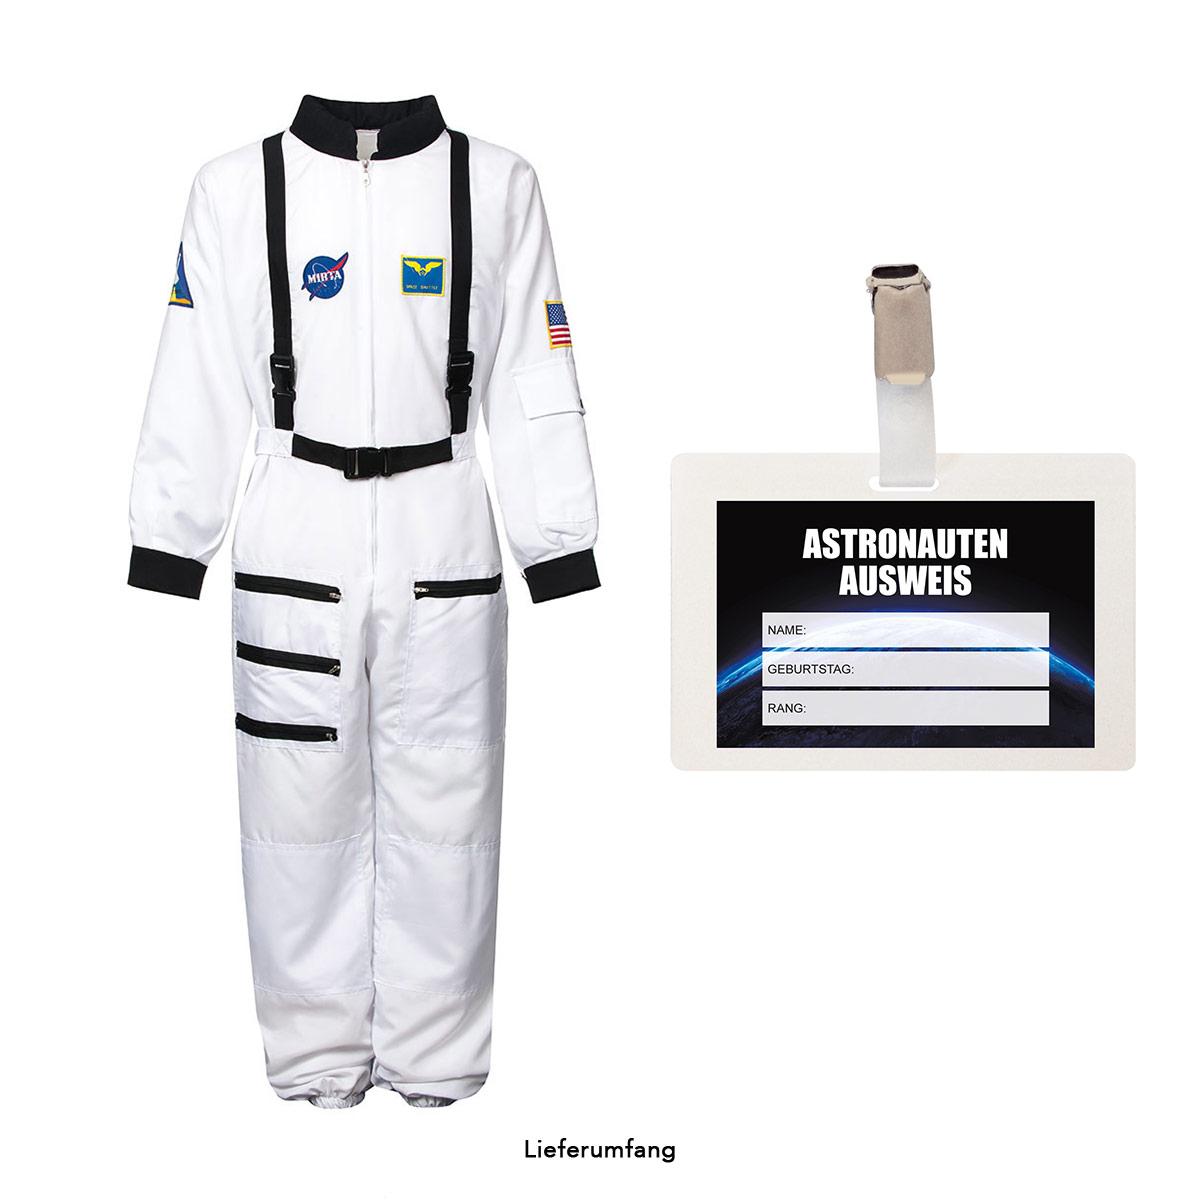 astronauten kost m kinder weltall space galaxy astronaut. Black Bedroom Furniture Sets. Home Design Ideas